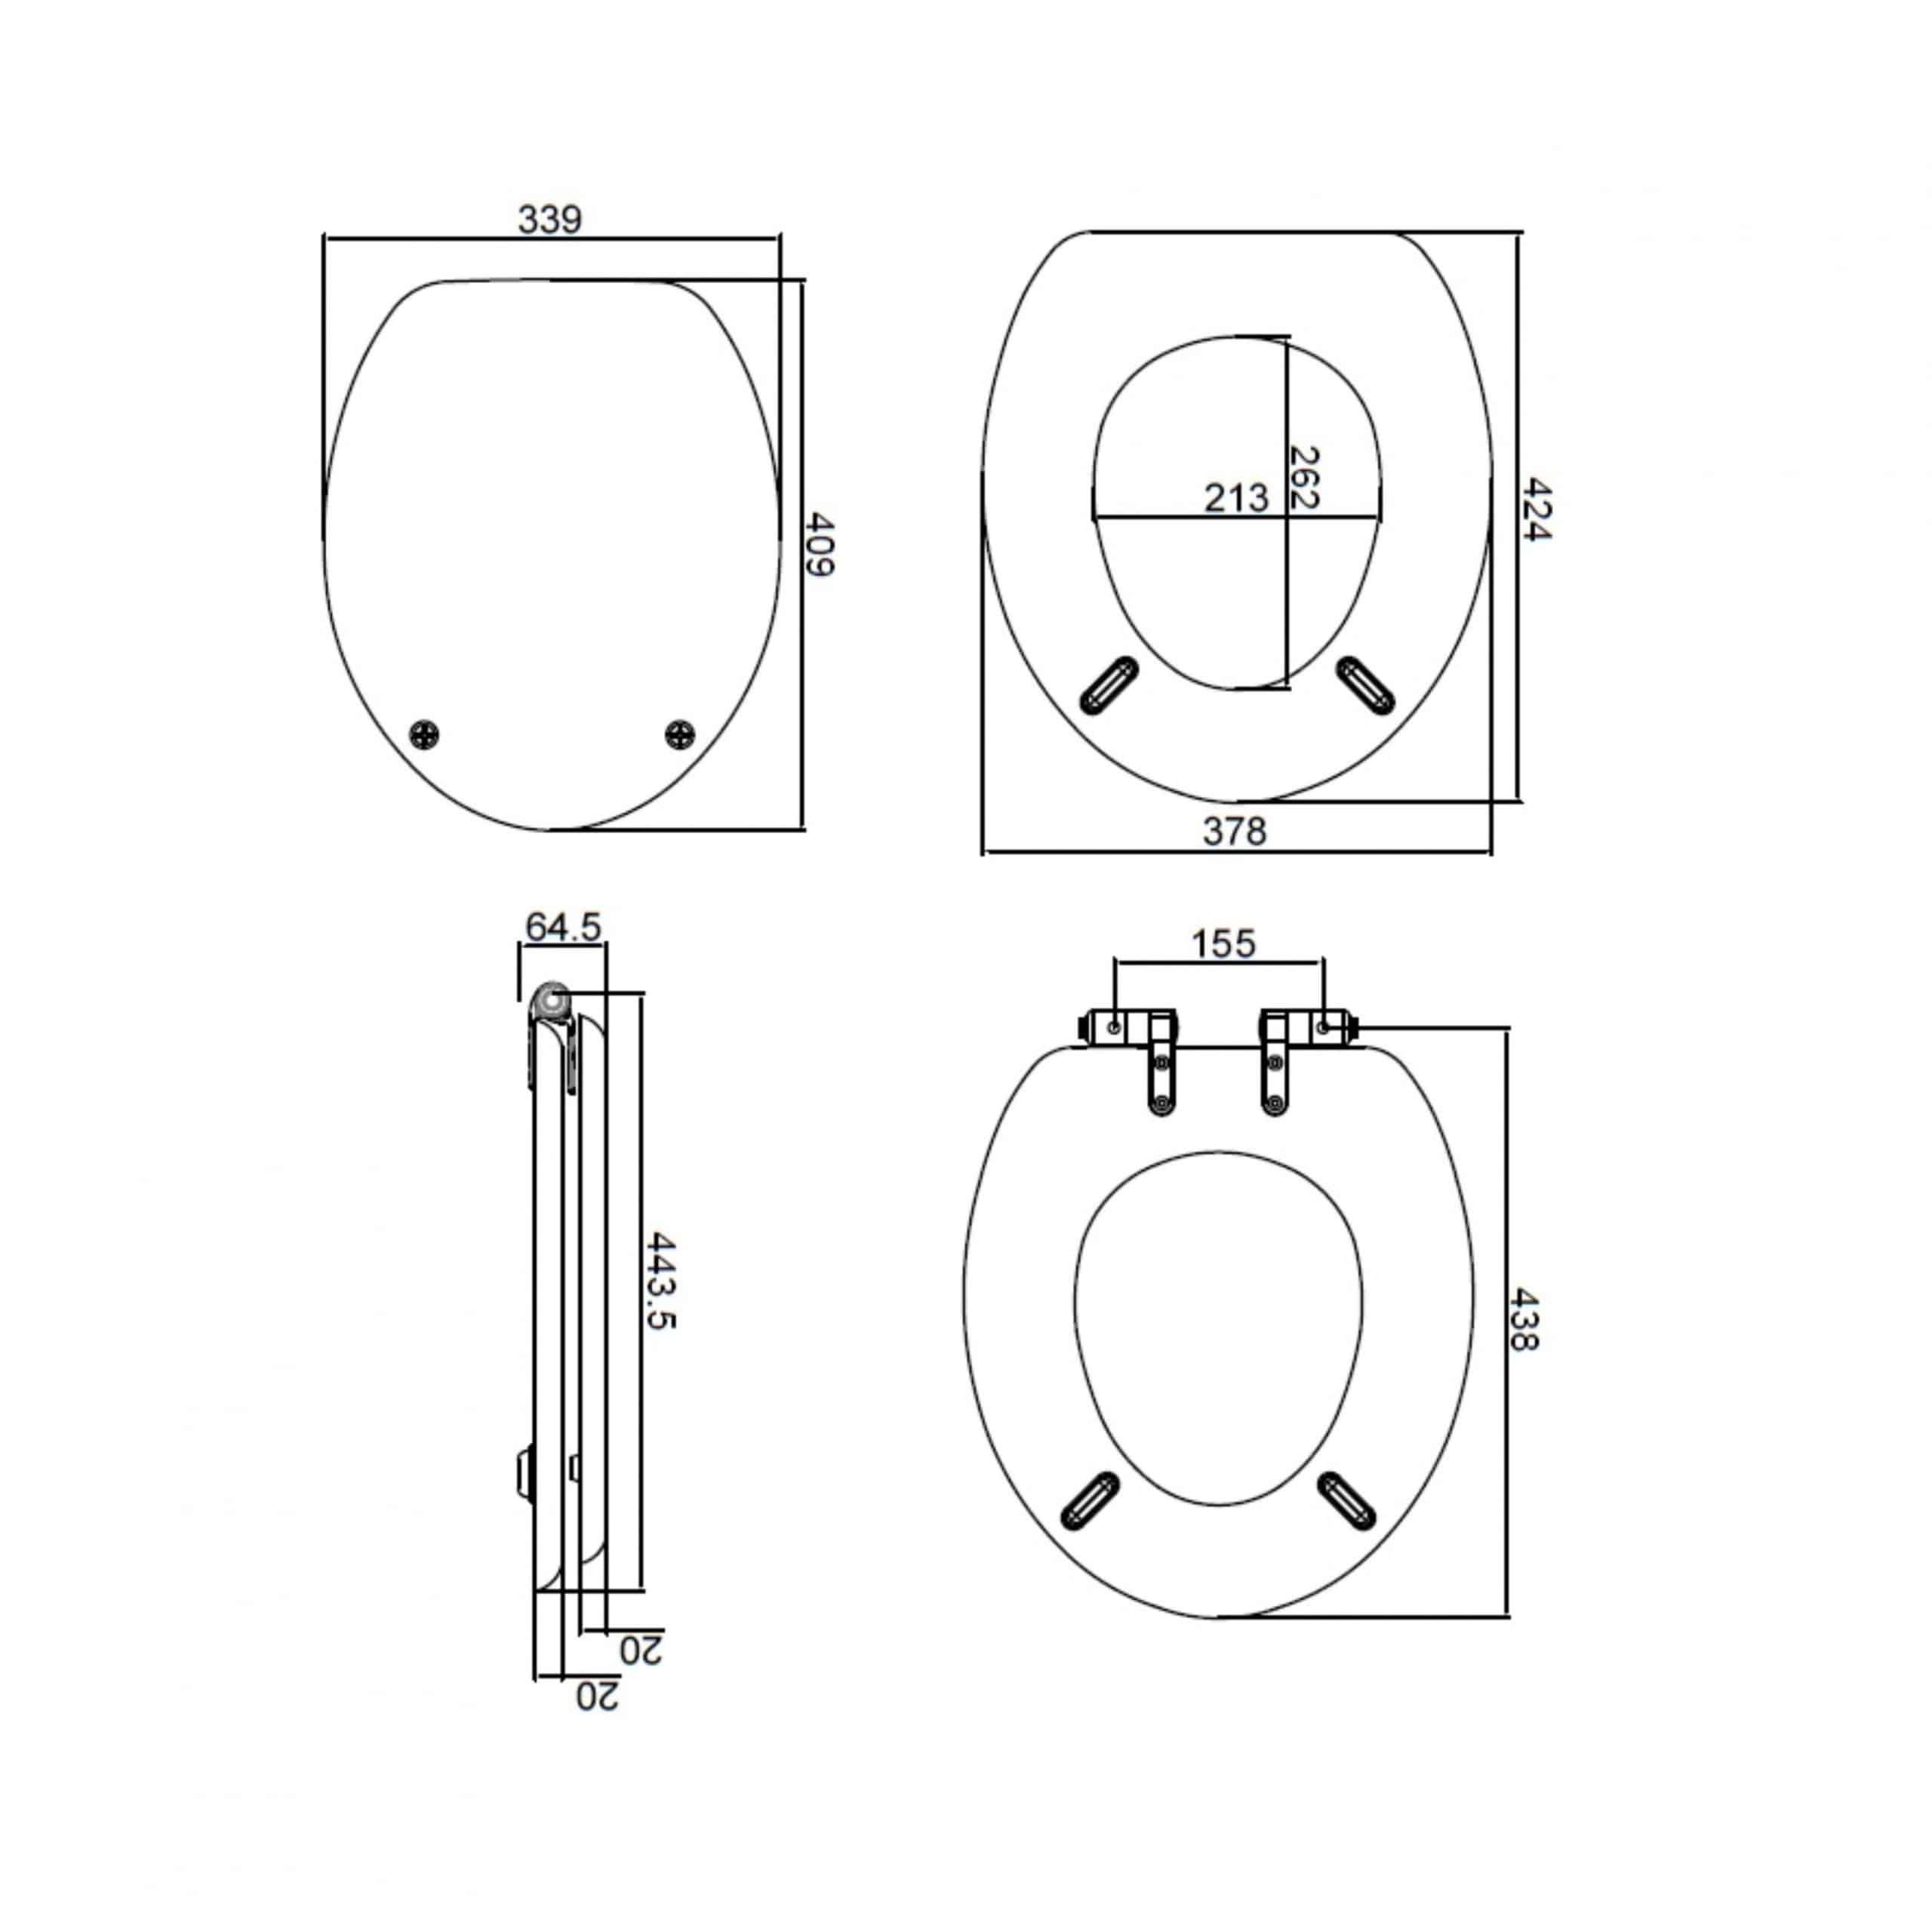 Heritage Seat TSWAS101SC Measurements